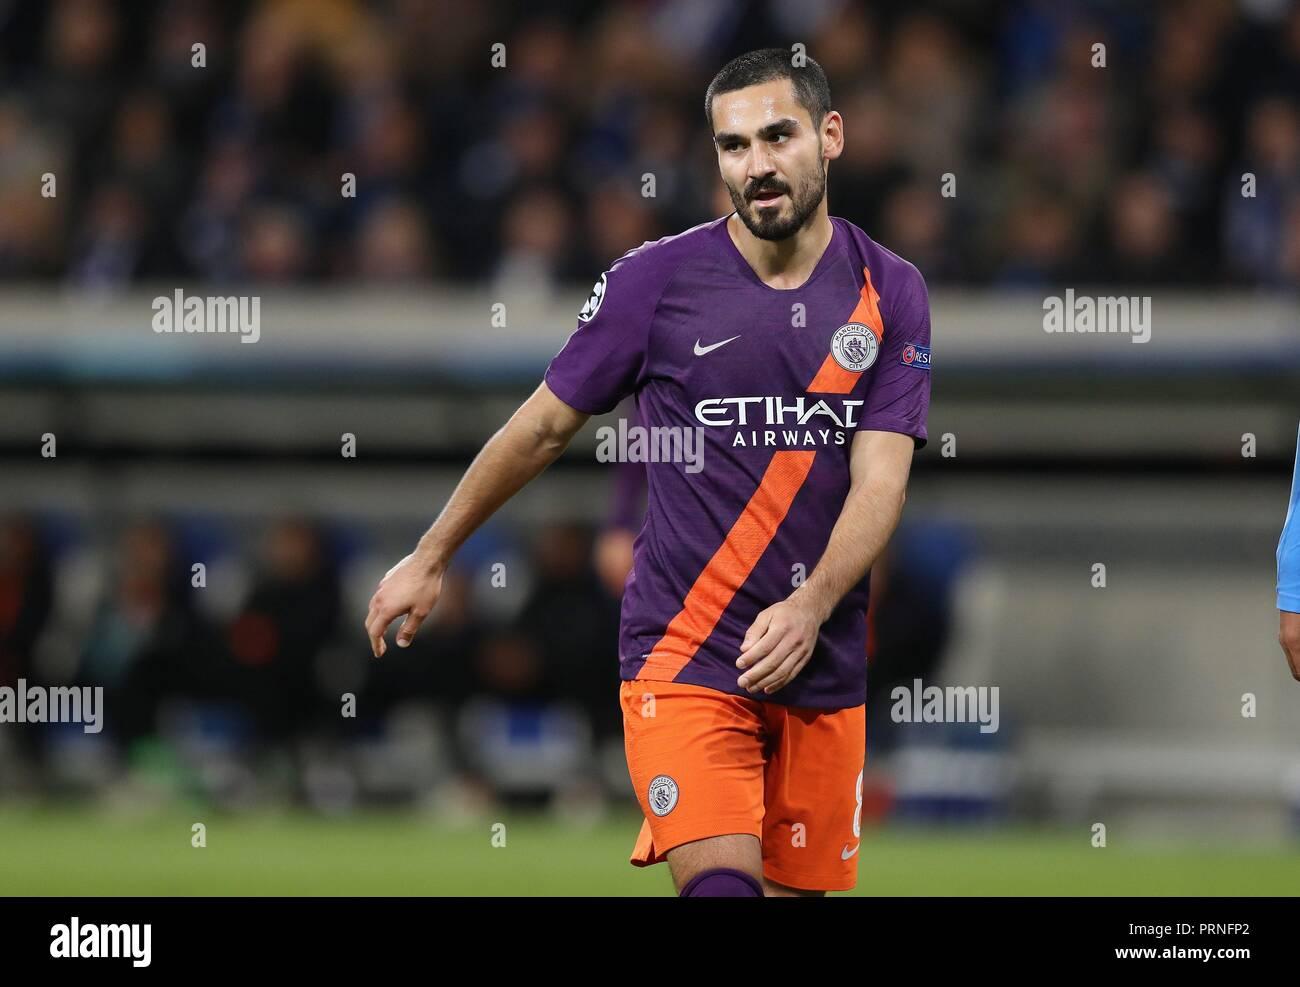 firo: 02.10.2018 Football, Football, Champions League: TSG Hoffenheim - Manchester City 1: 2 Ilkay Gundogan, half figure   usage worldwide - Stock Image